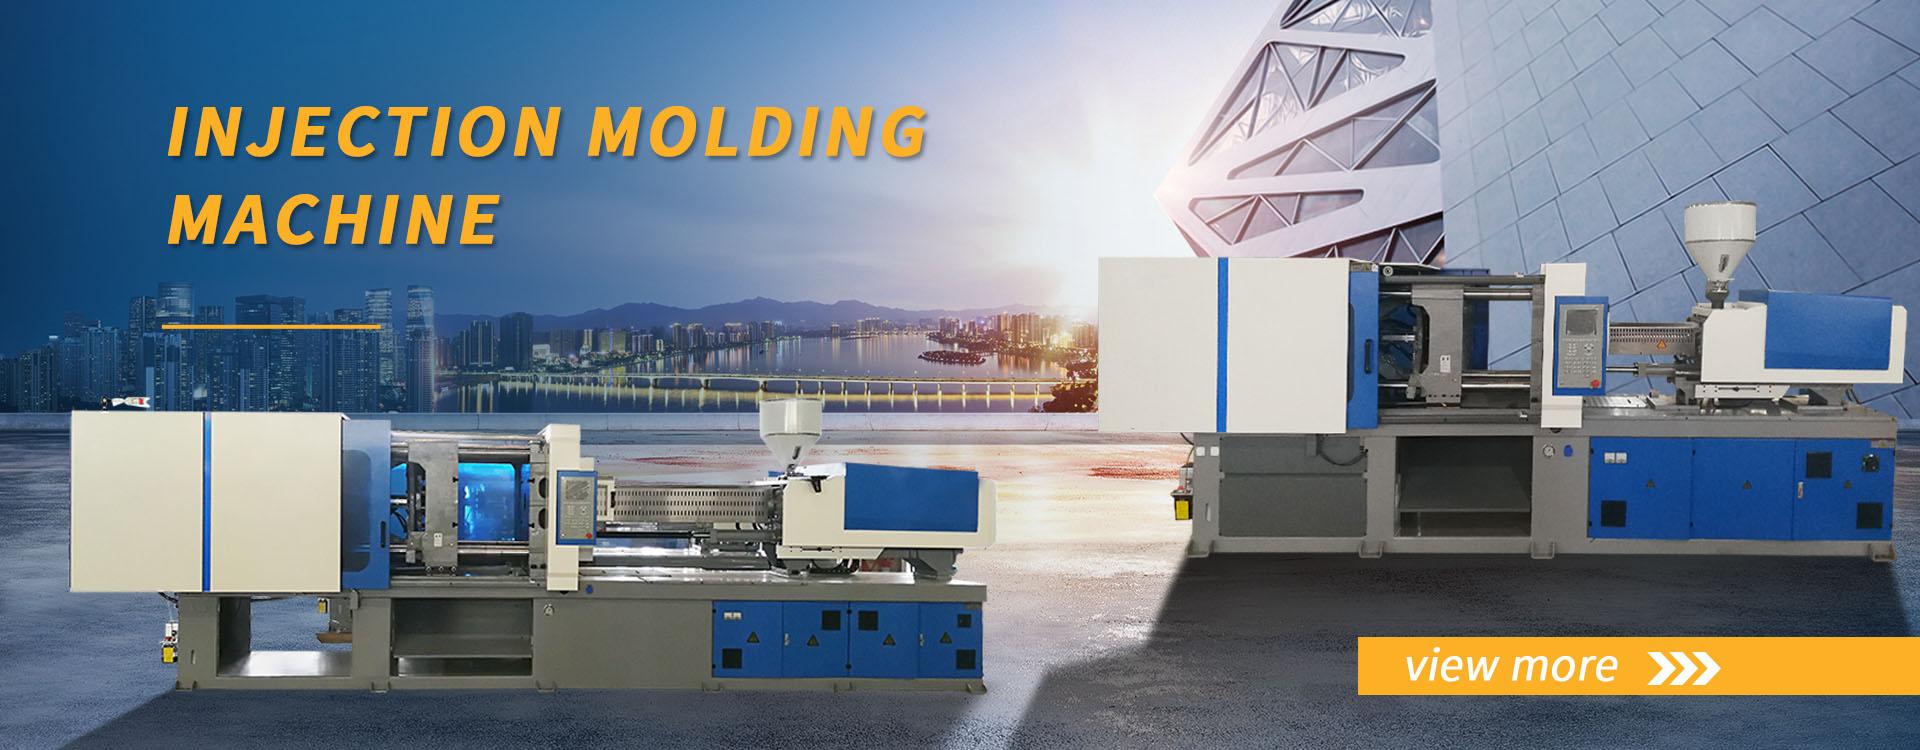 Medical Injection Molding Machine